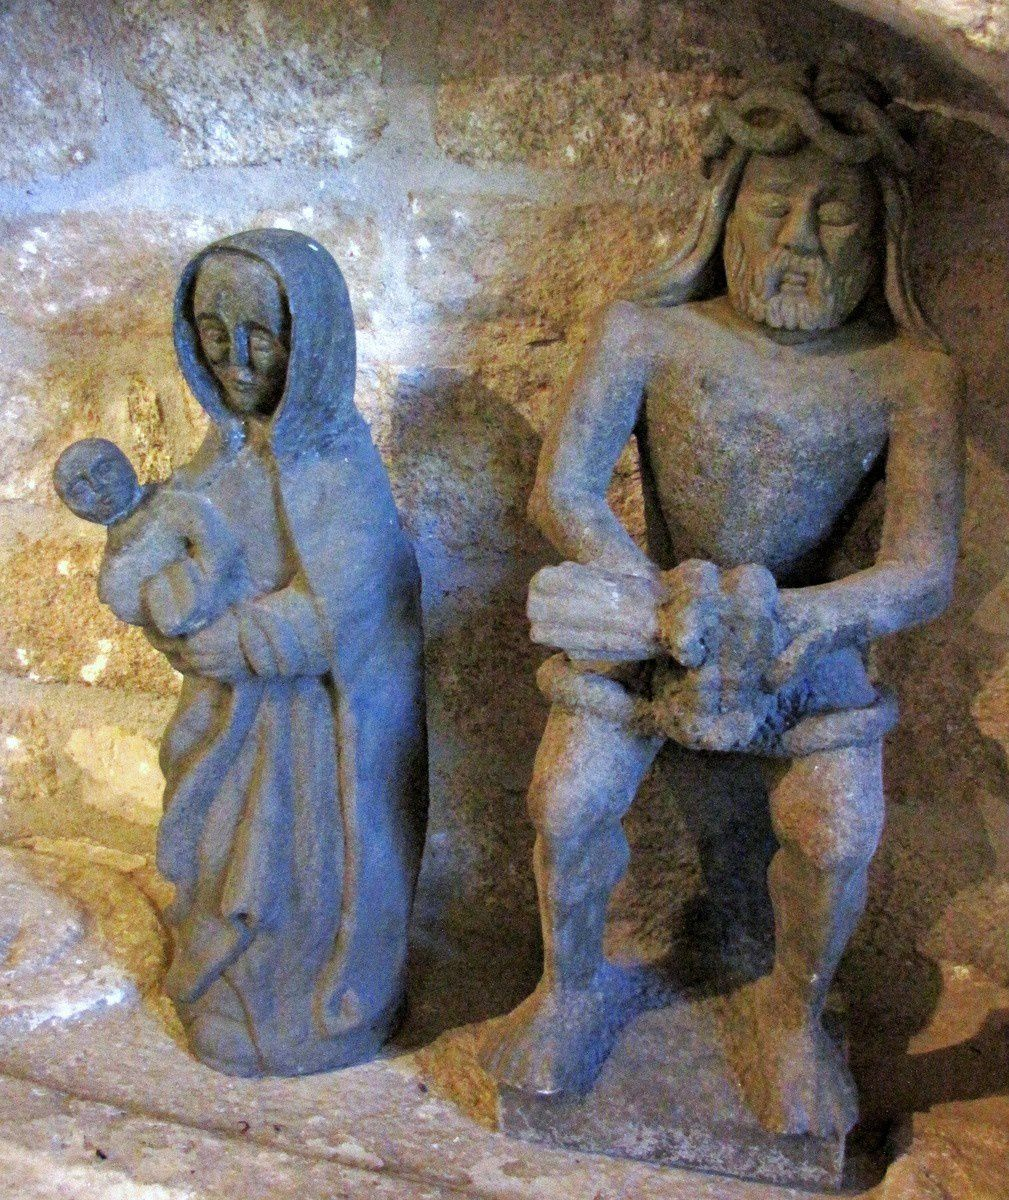 Vierge et Christ en kersanton, chapelle de Beuzec